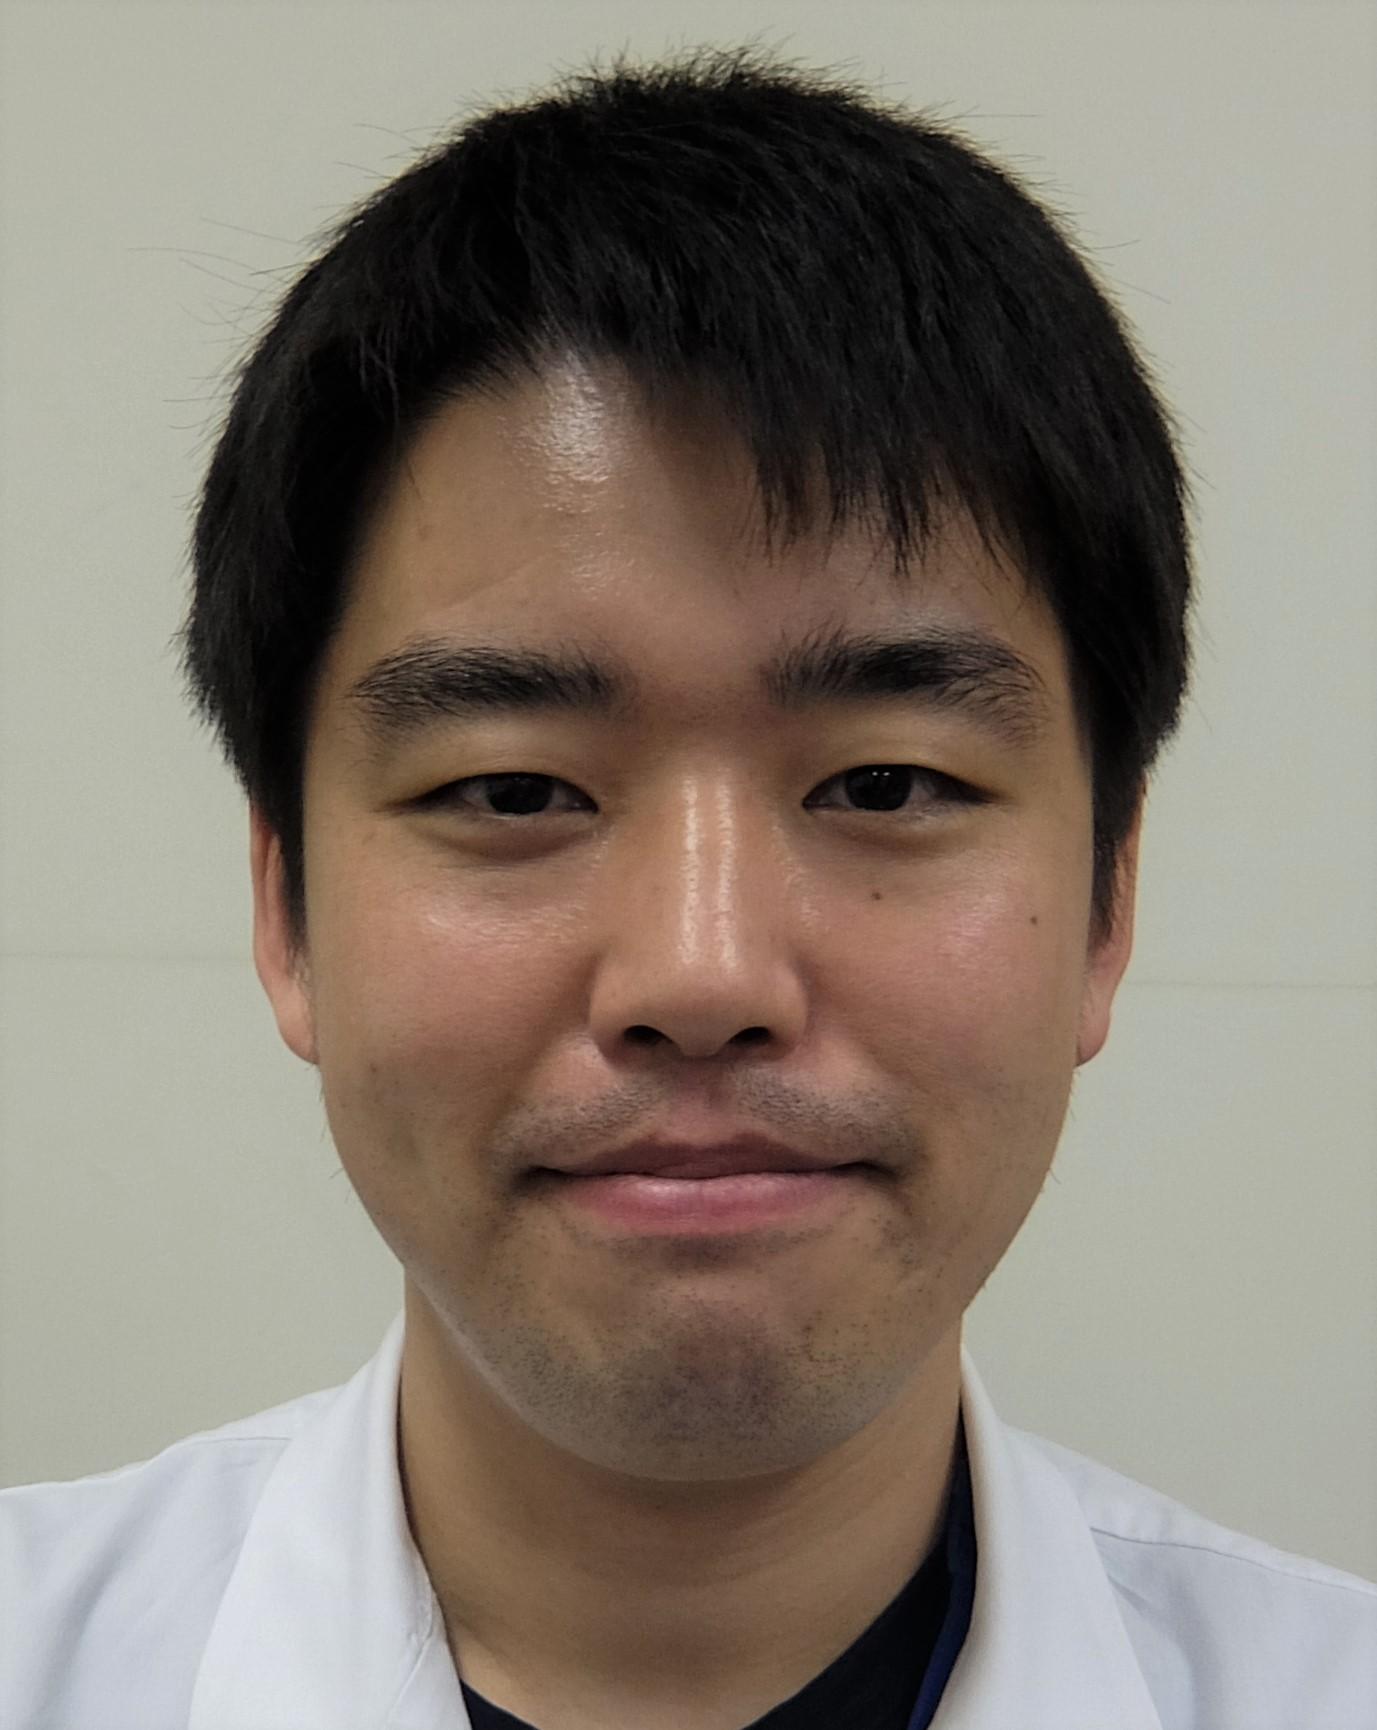 Shohei Ikeda, MD, PhD   Email Shohei   2017-Present: Assistant Professor, Dept of Cardiovascular Medicine, Tohoku Univeristy Hospital 2015-2017 Postdoctoral Fellow, Rutgers NJMS 2014-2015     Clinical Physician, Iwate Prefectural Hospital, Morioka, Iwate, Japan 2010-2014  PhD, Tohoku University Grad. Sch. of Med.,Sendai, Miyagi, Japan 2007-2010  Internship, Sendai Medical Center, Sendai, Miyagi, Japan 2001-2007  MD, Faculty of Medicine, Tohoku University, Sendai, Miyagi, Japan 2010-2014  PhD in Tohoku University Grad. Sch. of Med., Sendai, Miyagi, Japan